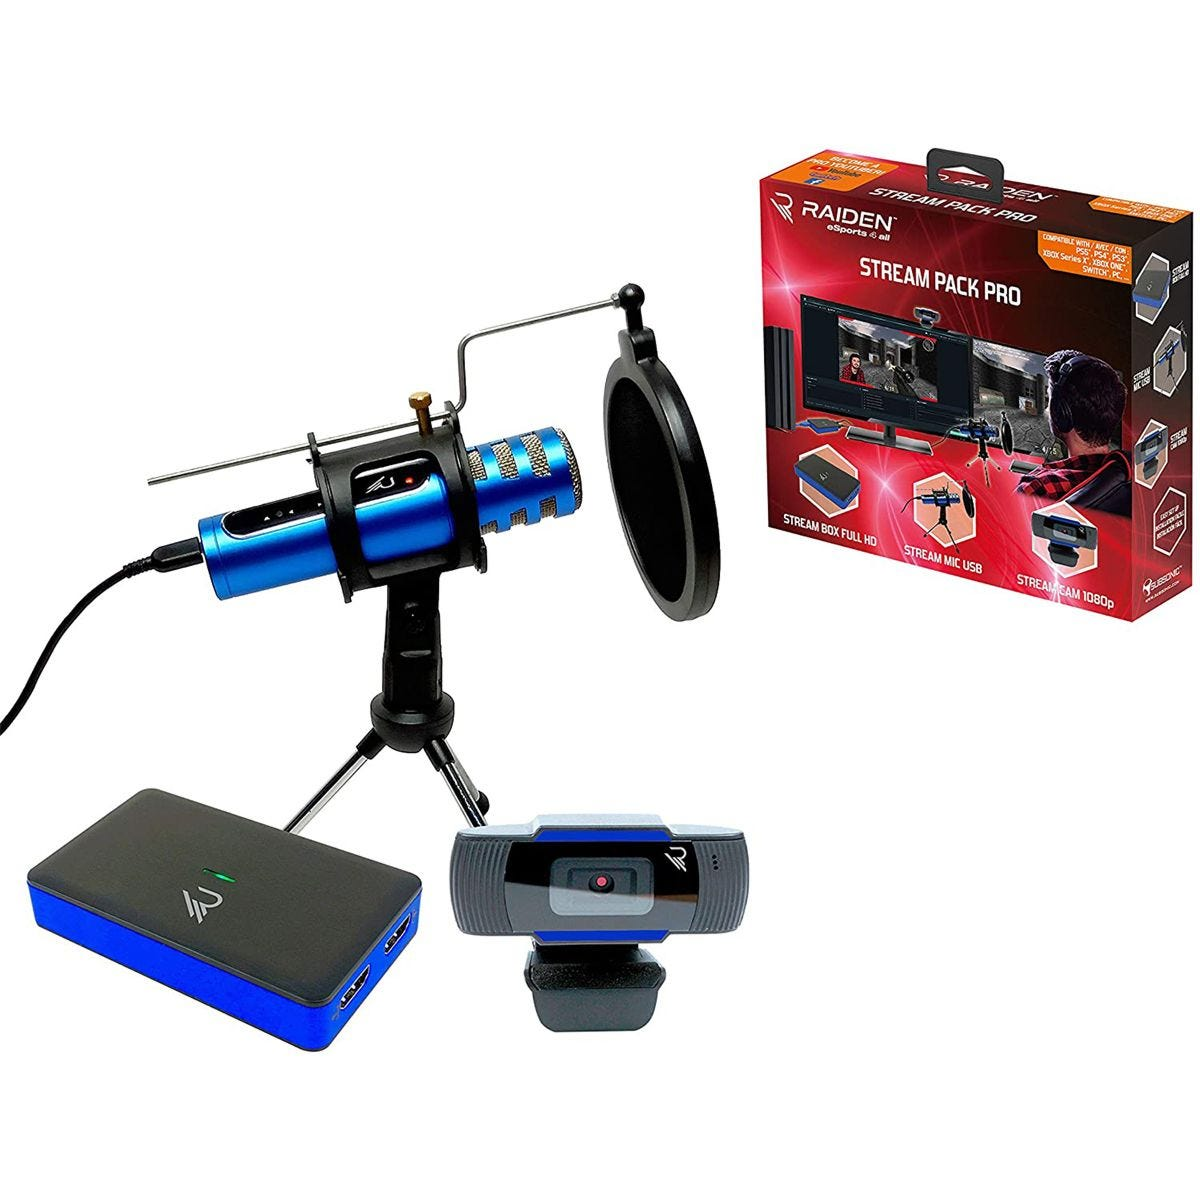 Raiden Stream Pack Pro for Youtubers/Online Gamers - Blue/Black